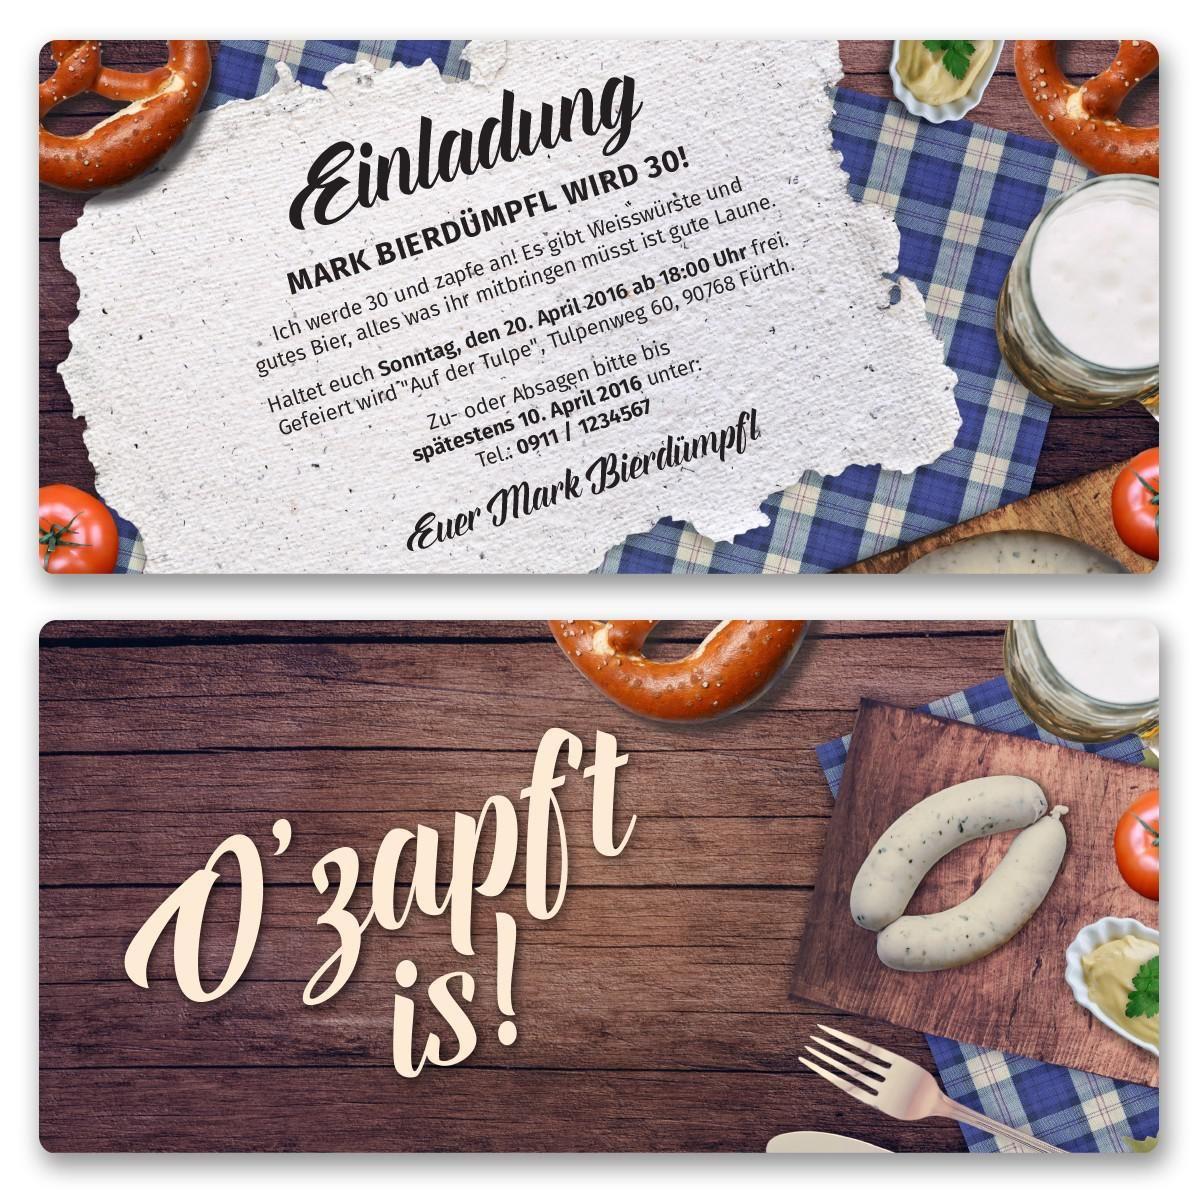 Einladungskarten Online : Einladungskarten Online Gestalten Kostenlos    Online Einladungskarten   Online Einladungskarten